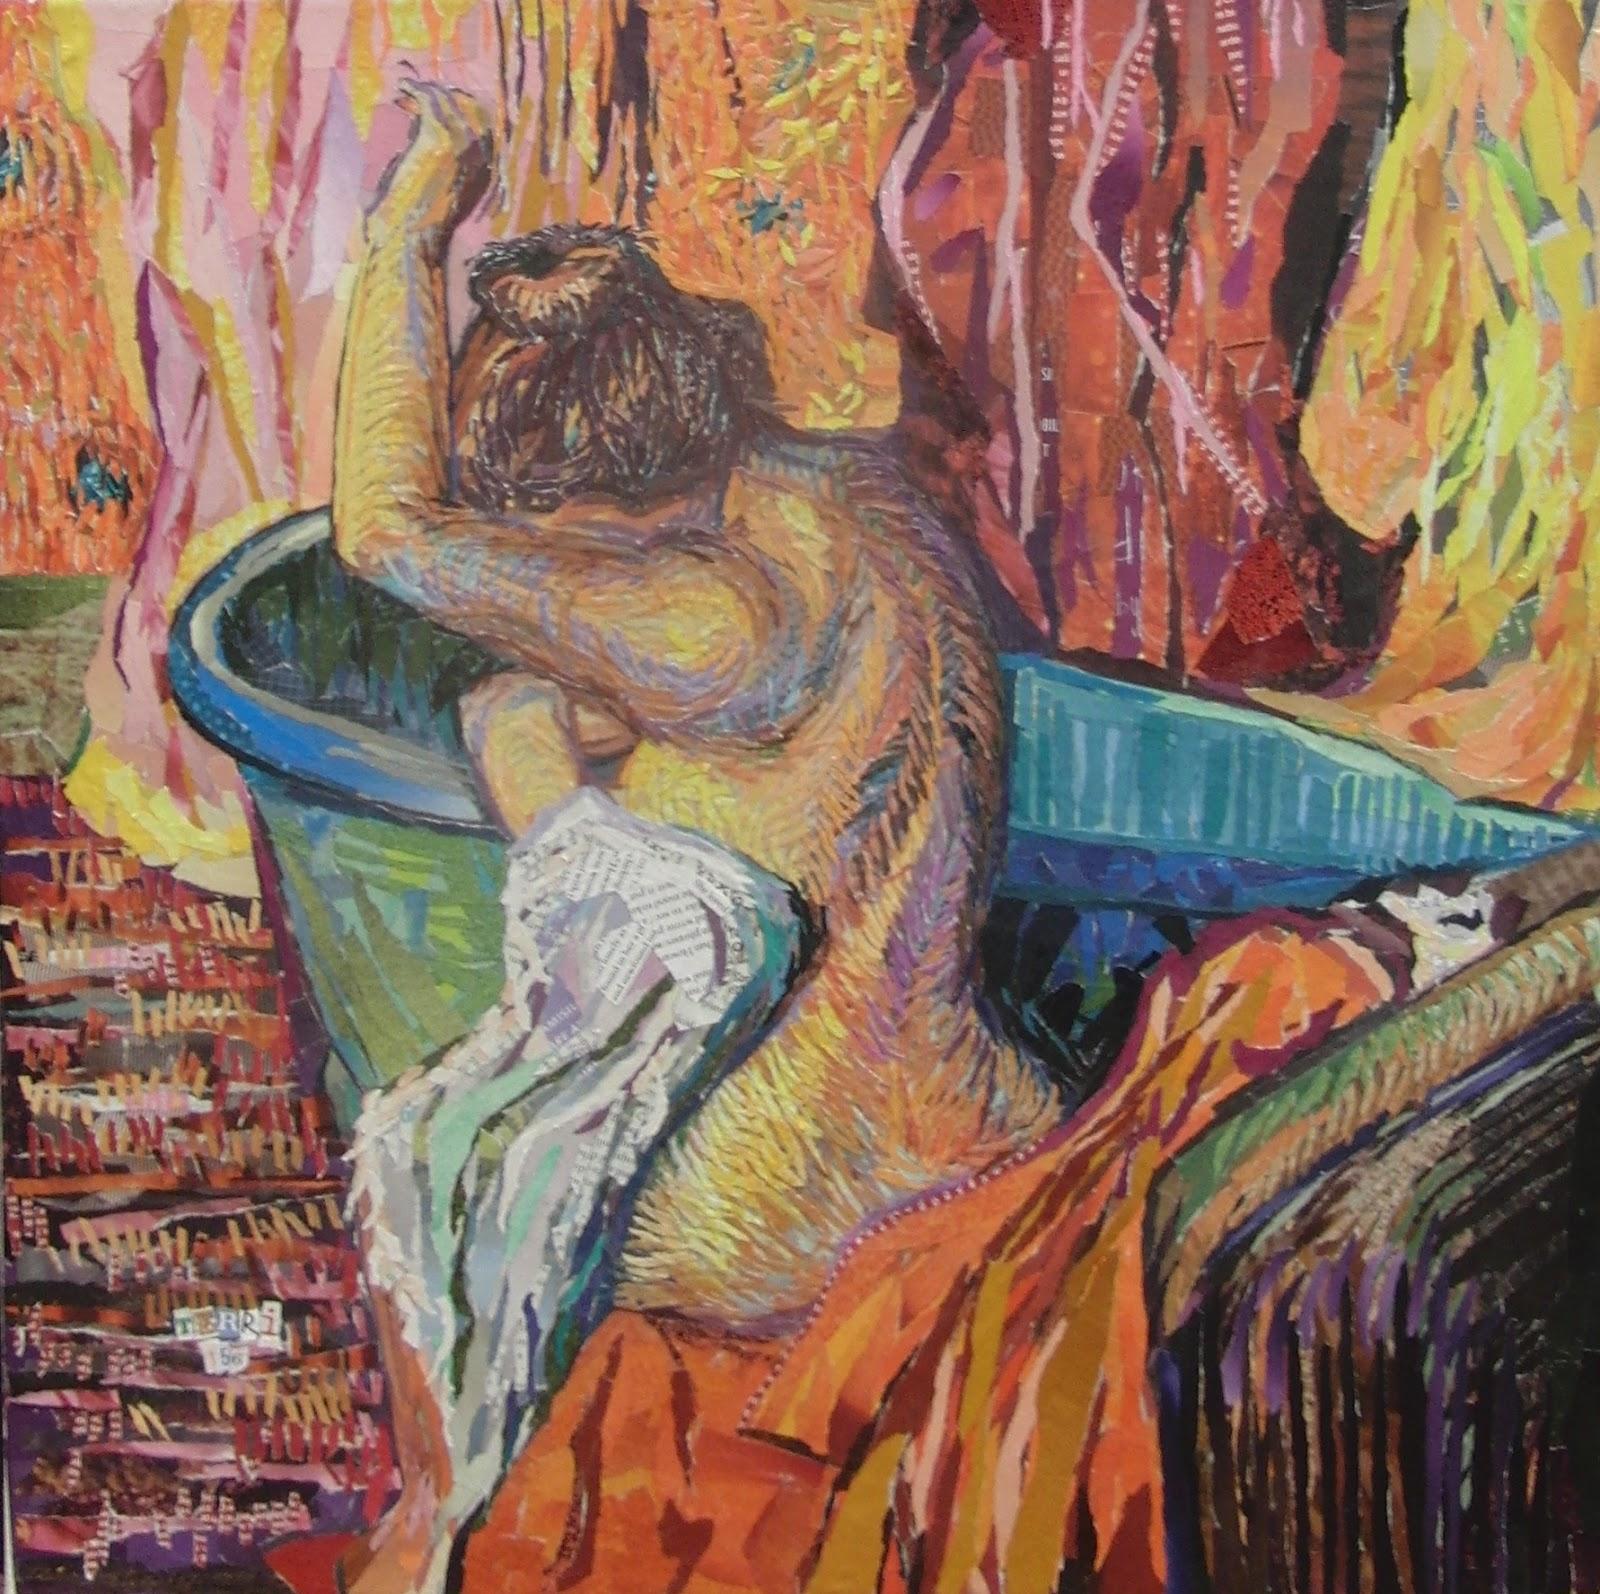 http://1.bp.blogspot.com/-xpAJy74st2g/UPmO5ywT6lI/AAAAAAAAAes/vGCzNwT4jP0/s1600/Torn+Paper+Art+Collage+Study+%23156.jpg